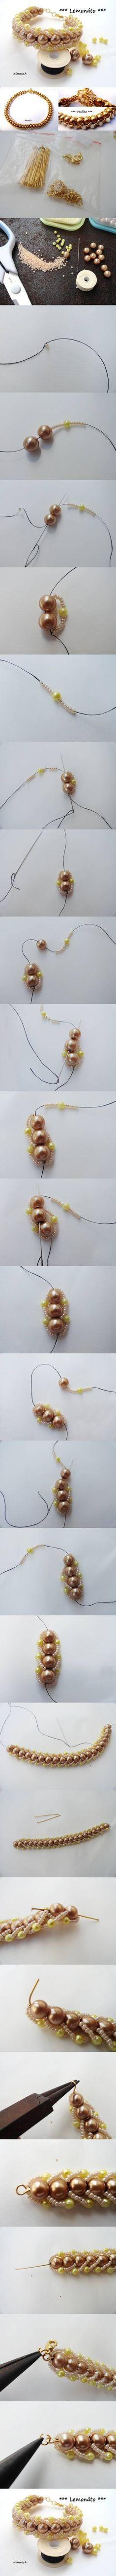 DIY Beads and Beads Bracelet DIY Beads and Beads Bracelet